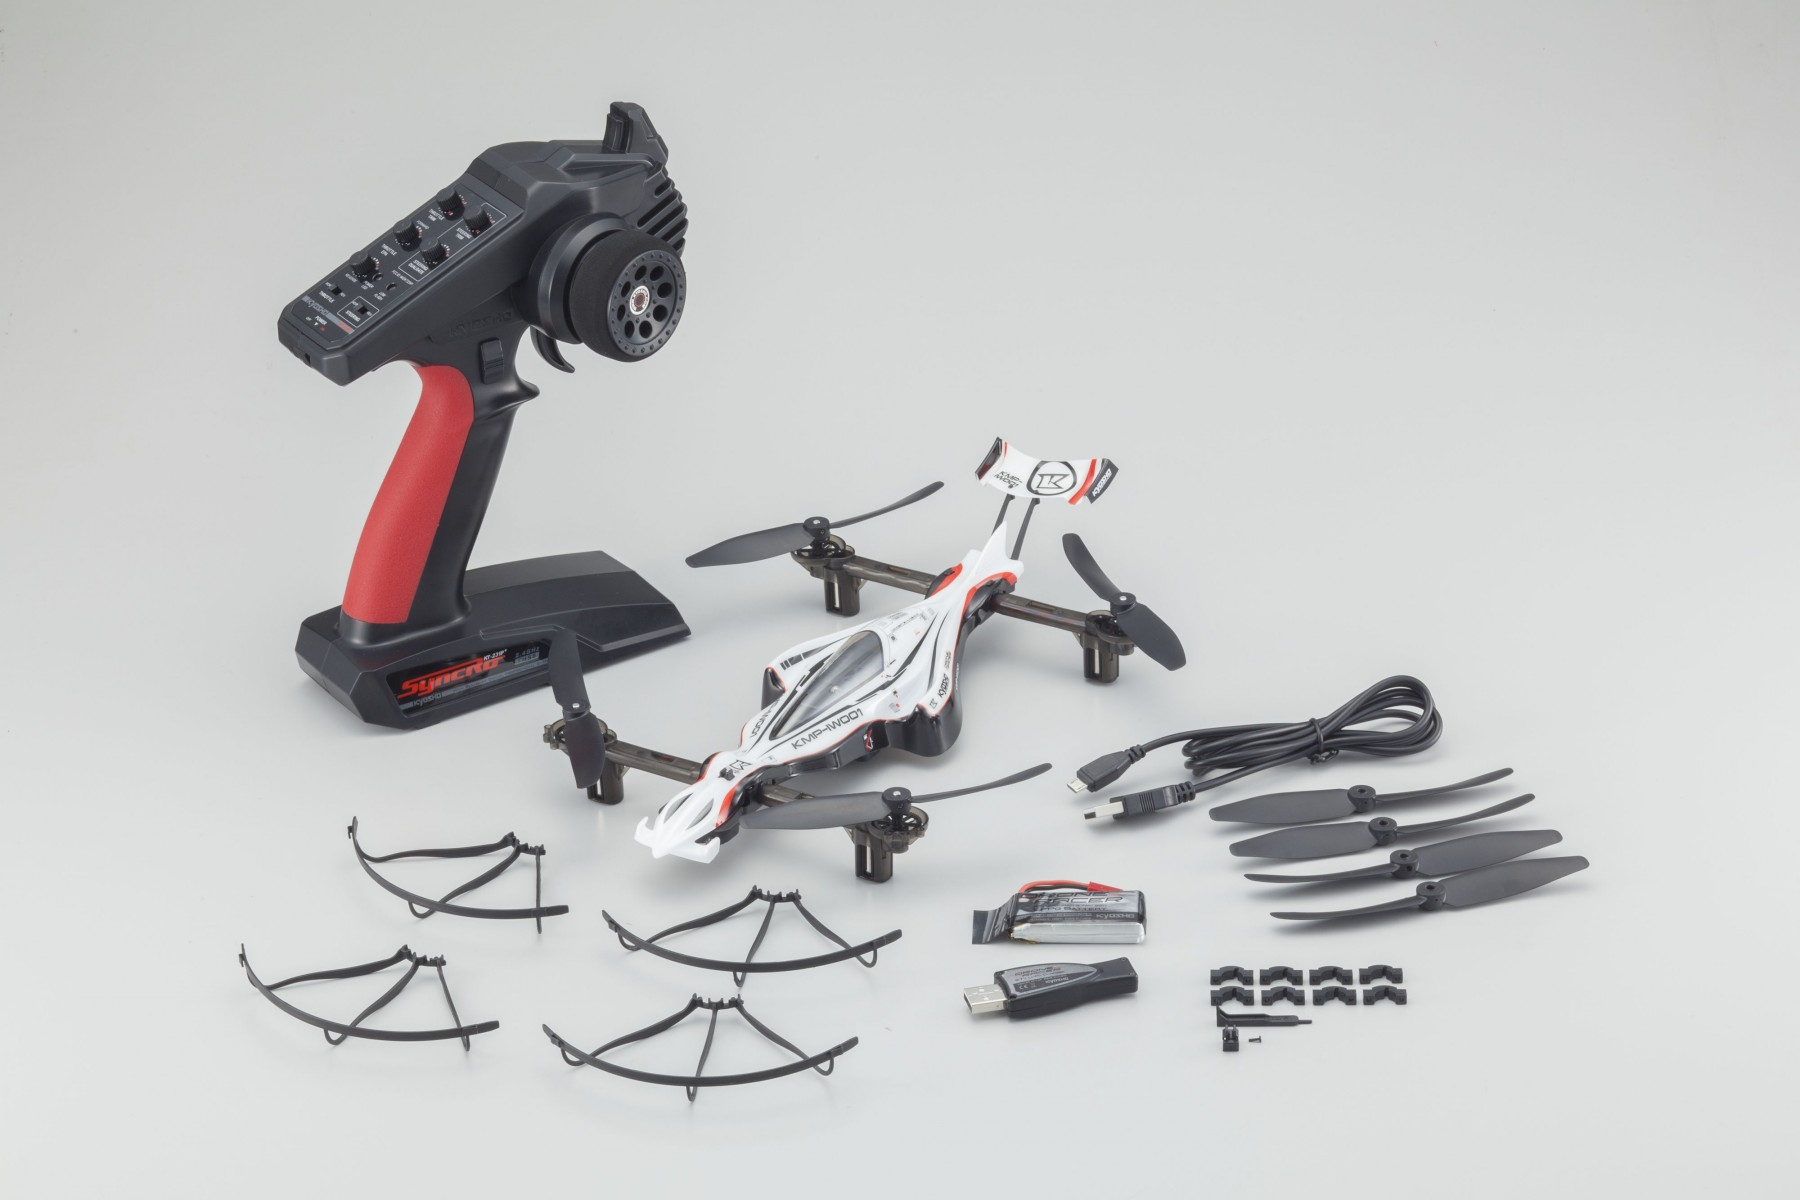 Kyosho drone racer g-zero dynamic 15